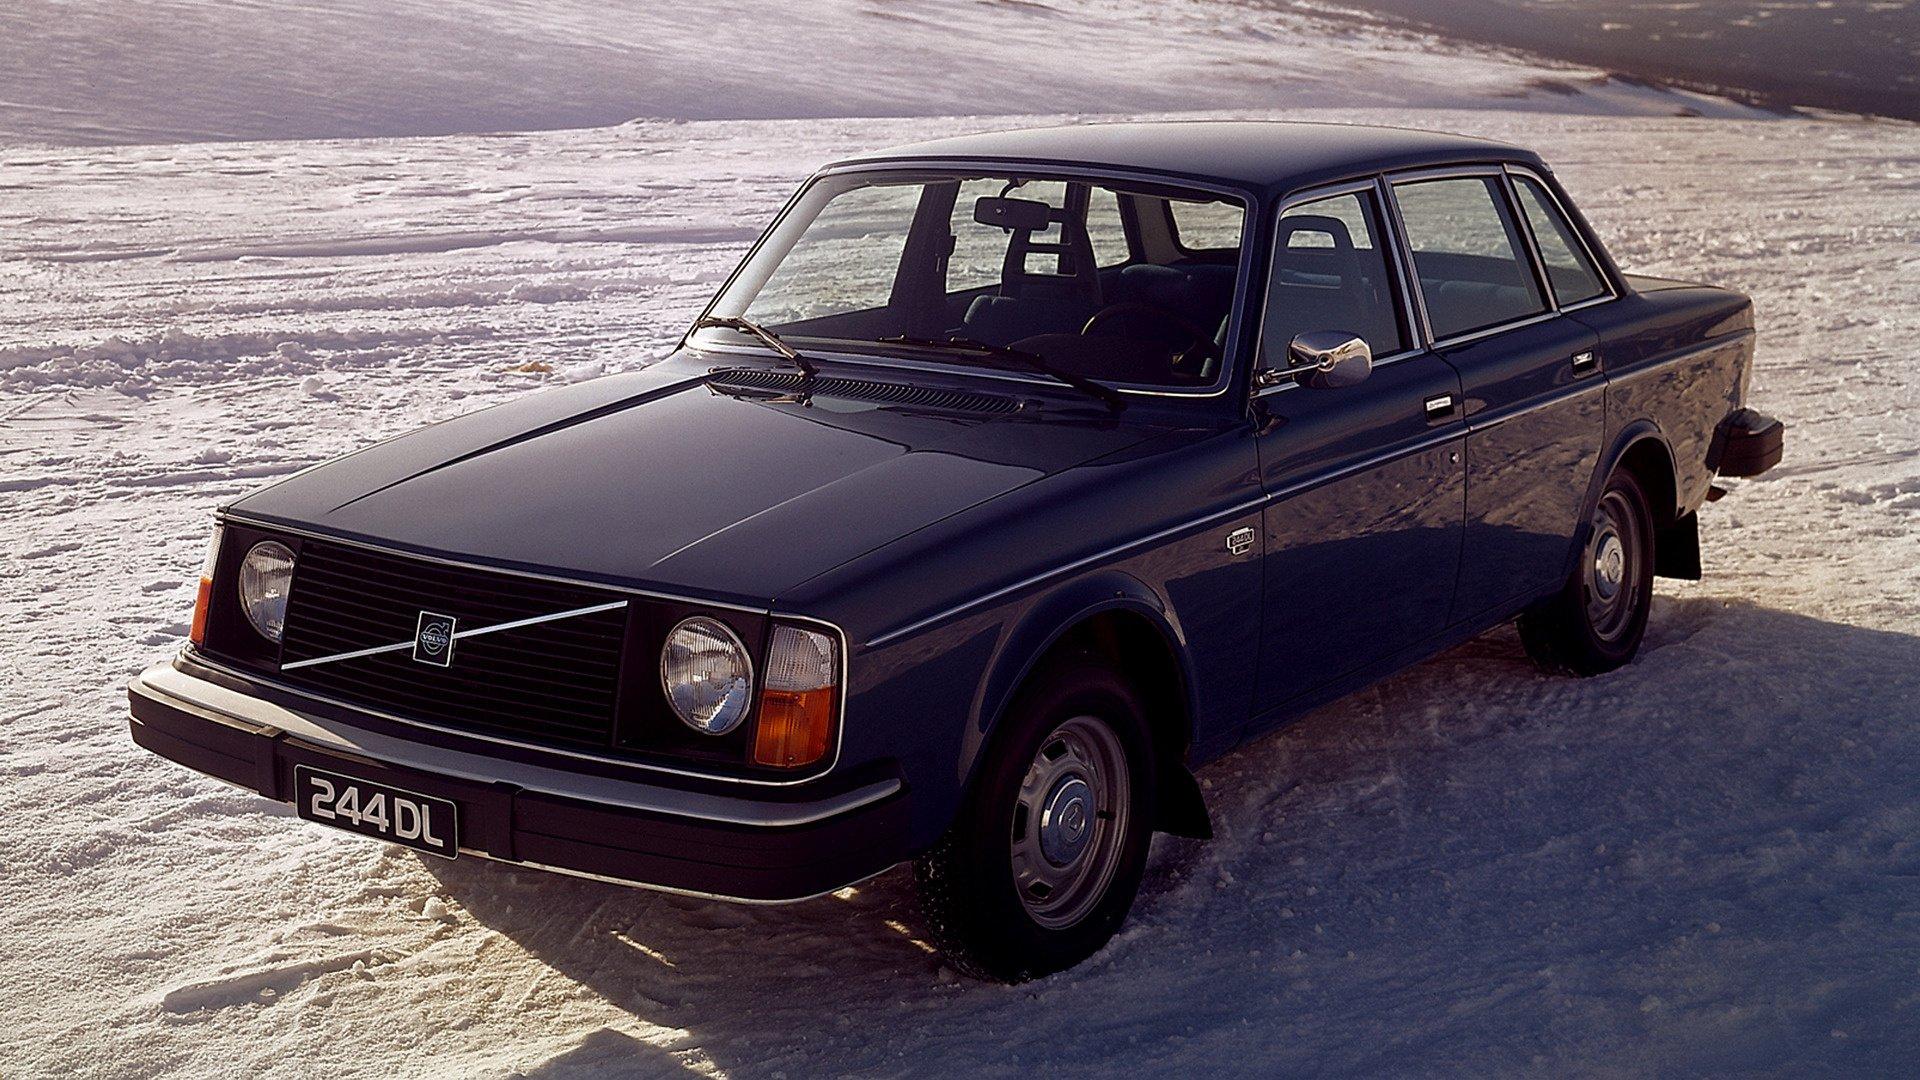 1975 Volvo 244 Dl Fond Décran Hd Arrière Plan 1920x1080 Id